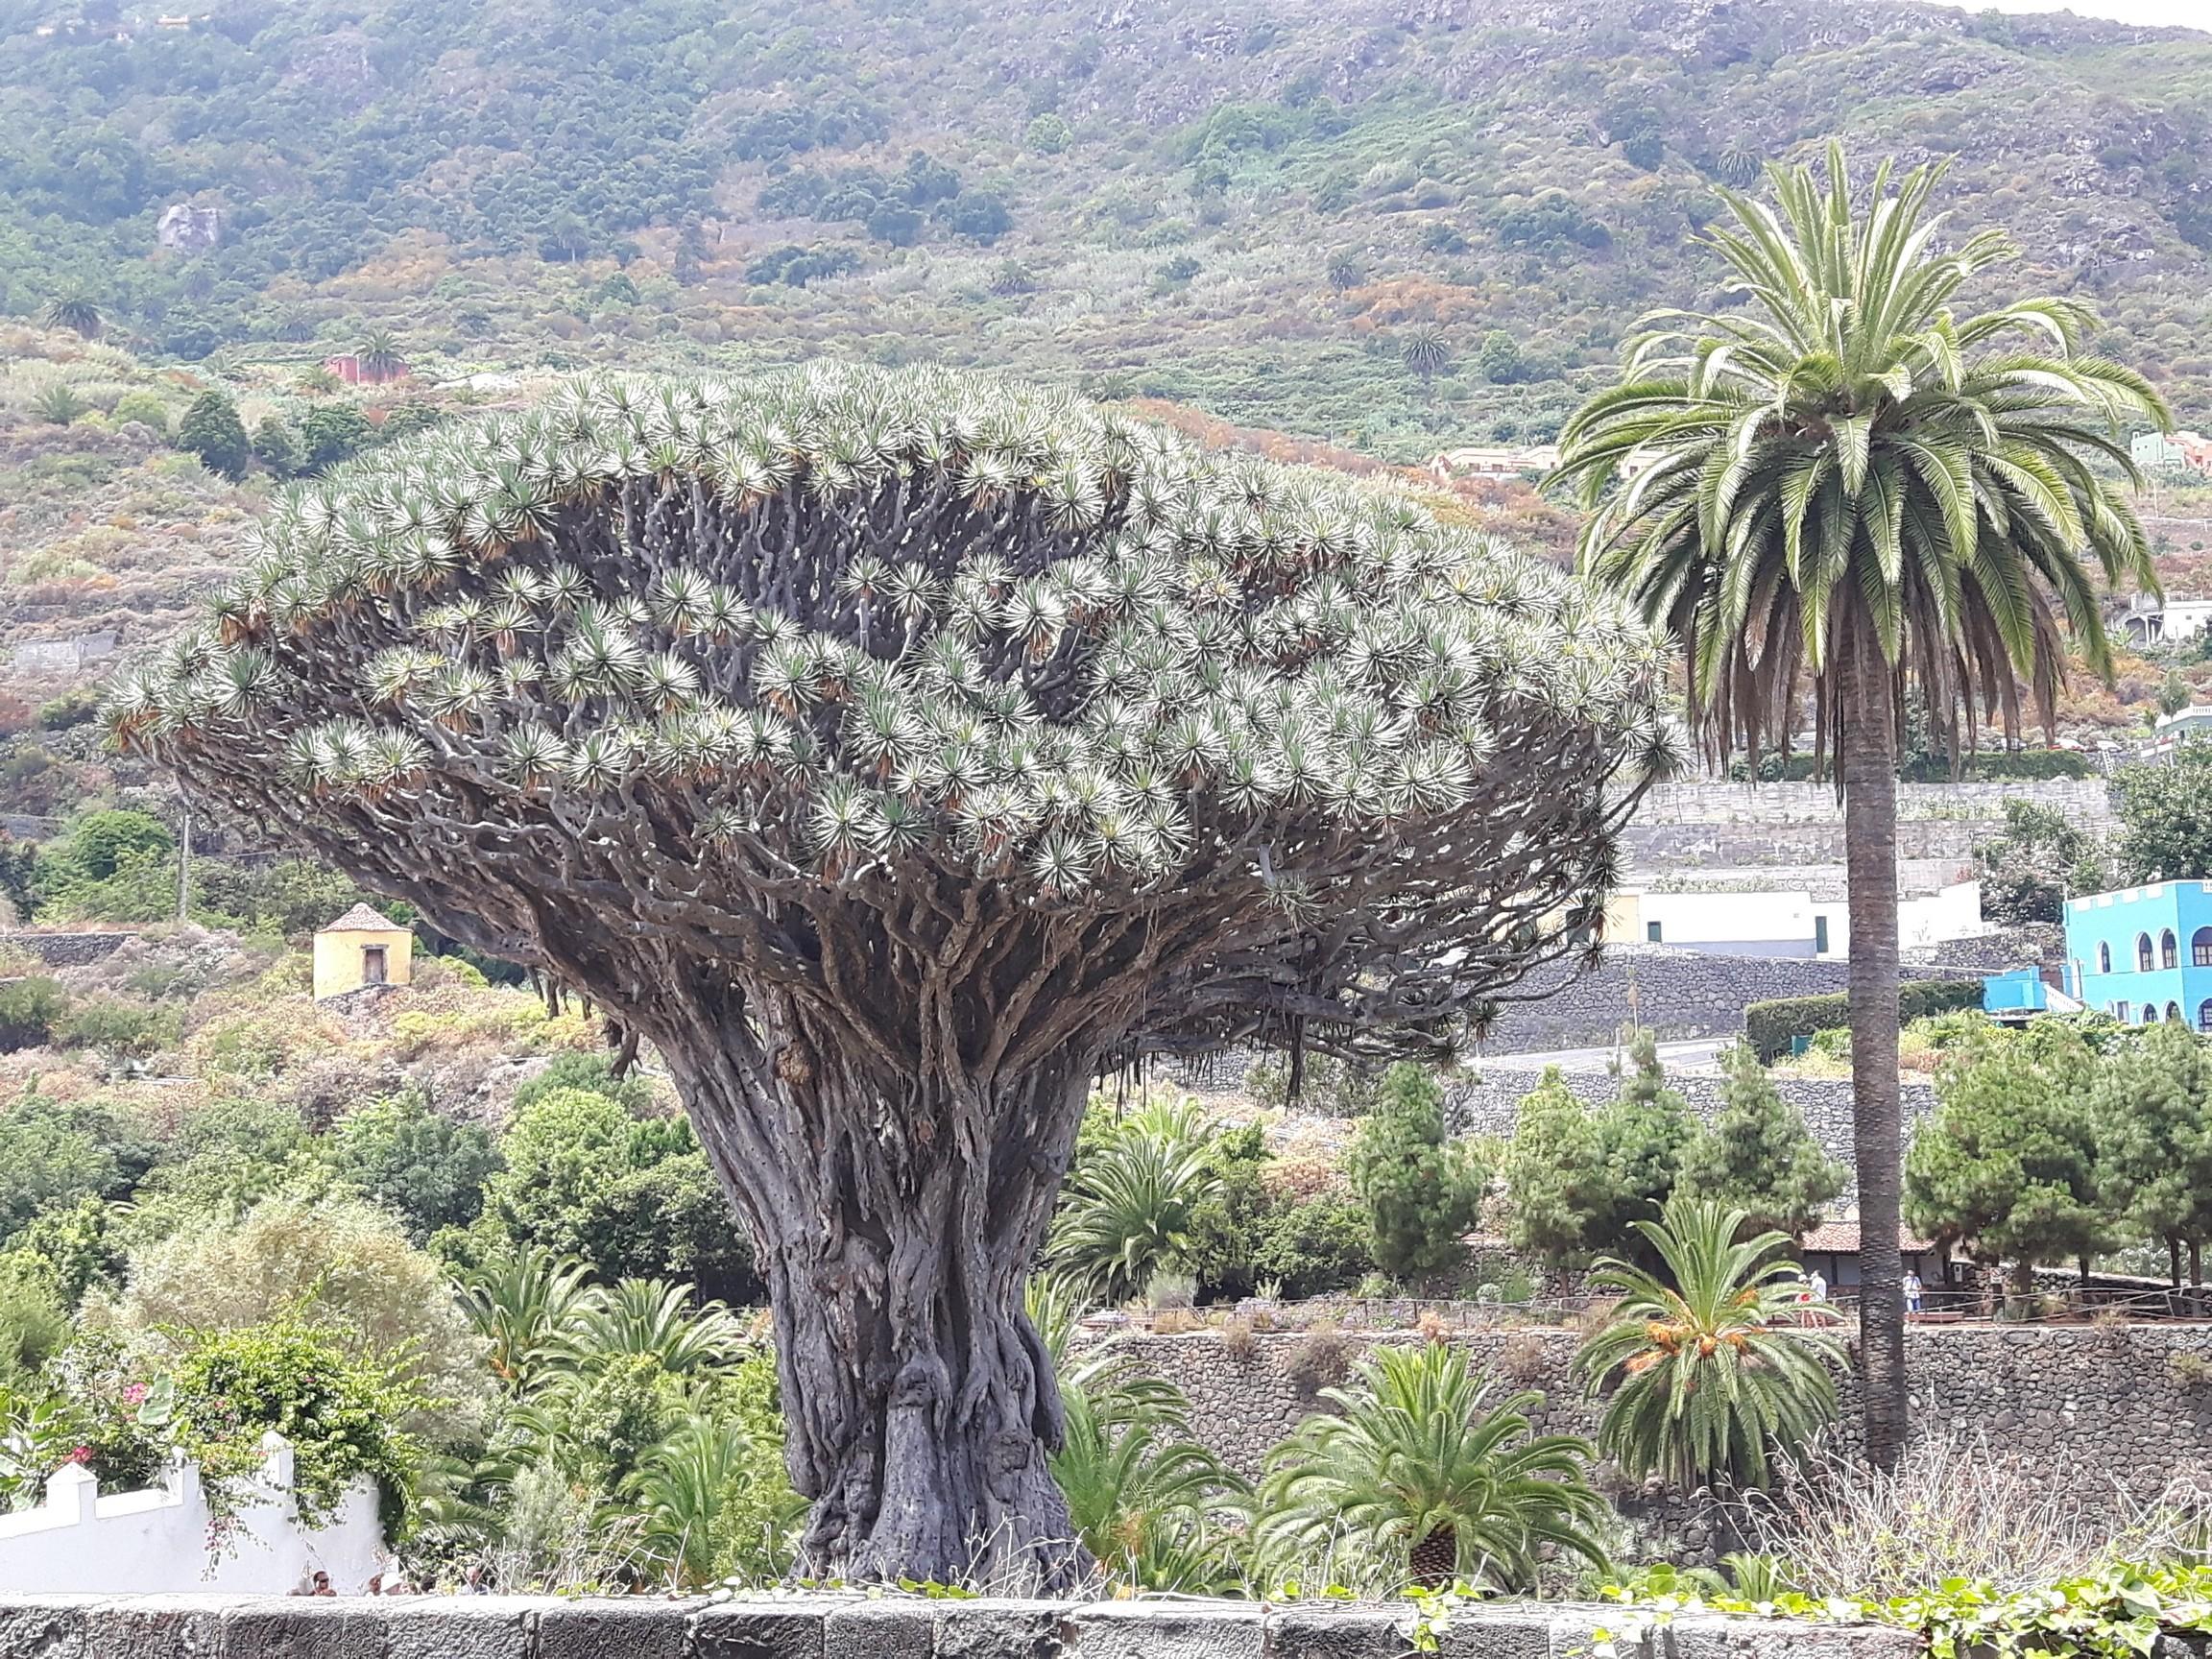 Drzewo Smocze Drago Milenario